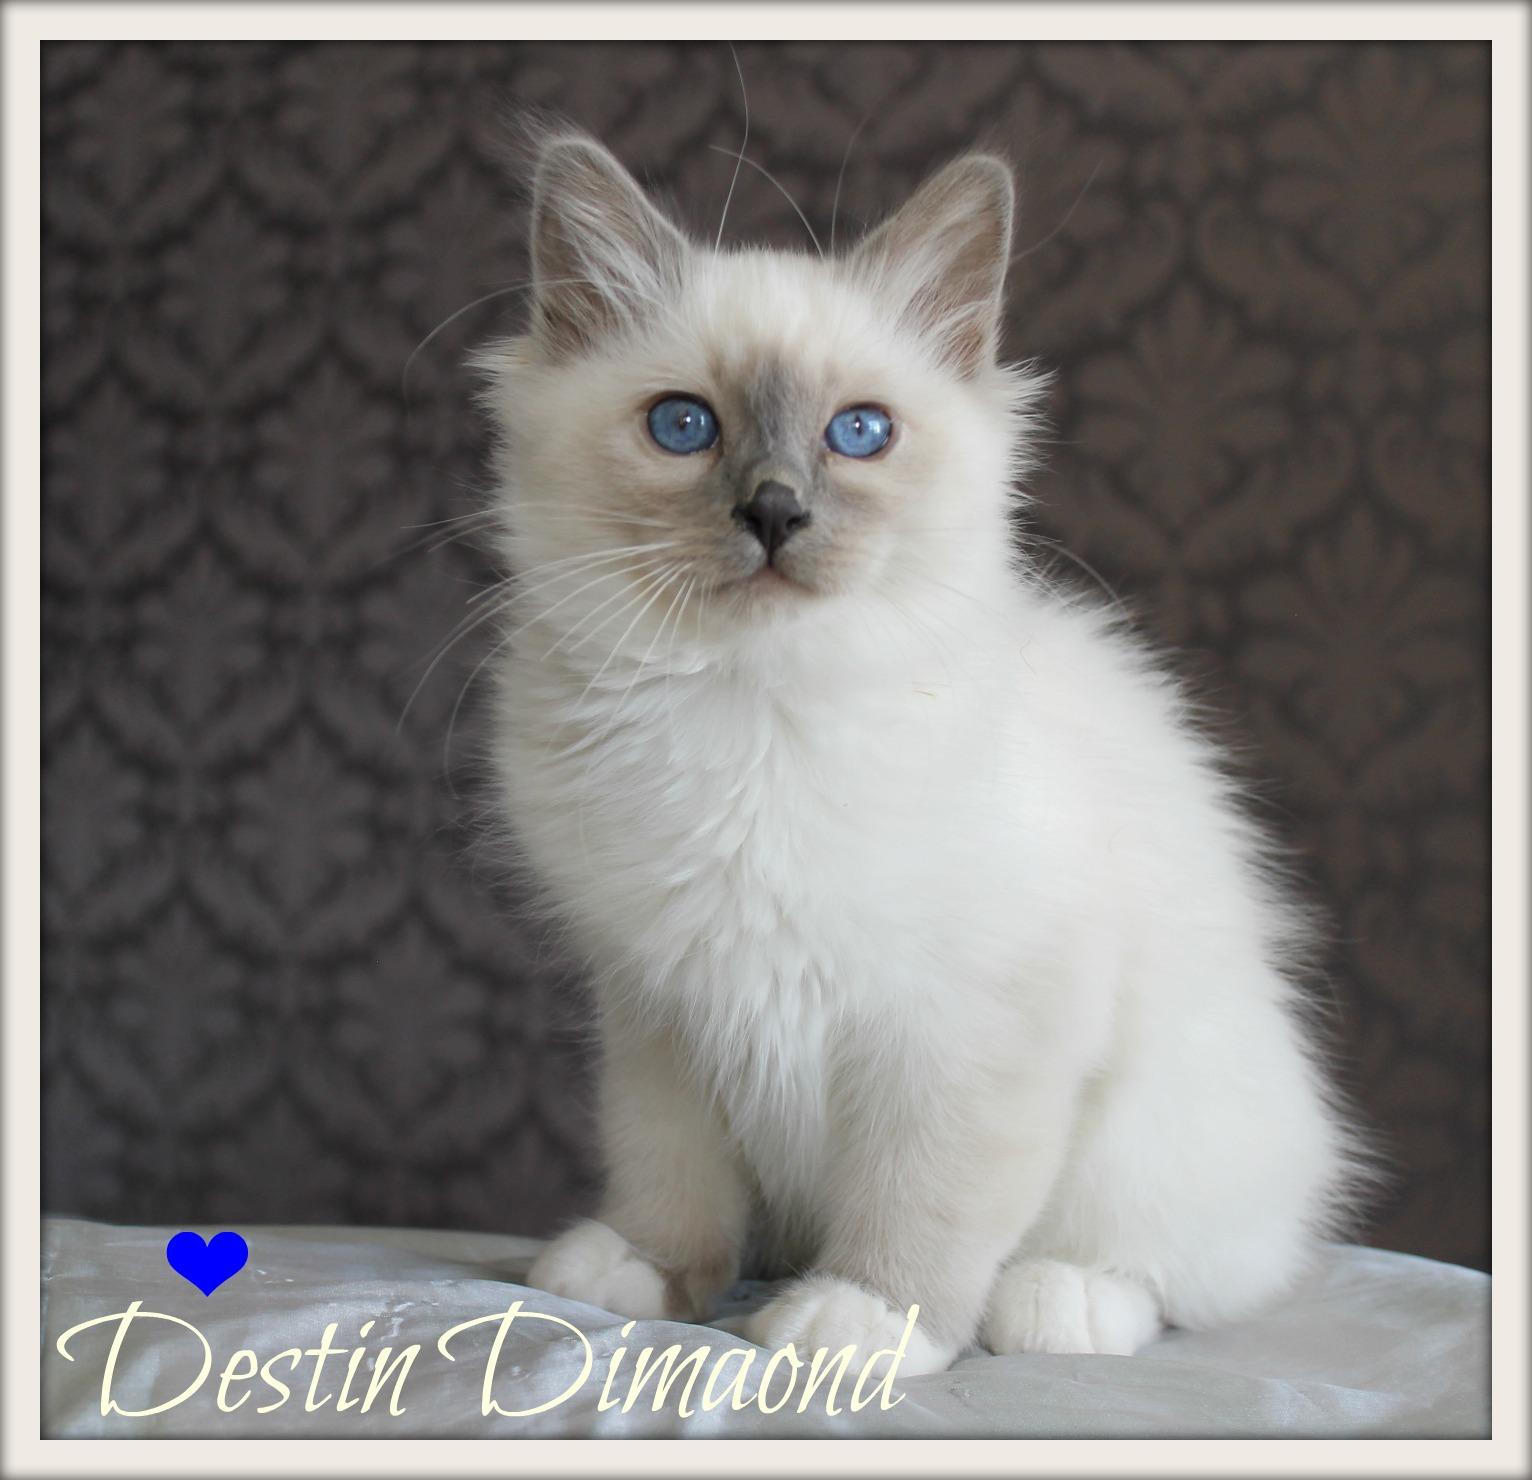 destin-sp